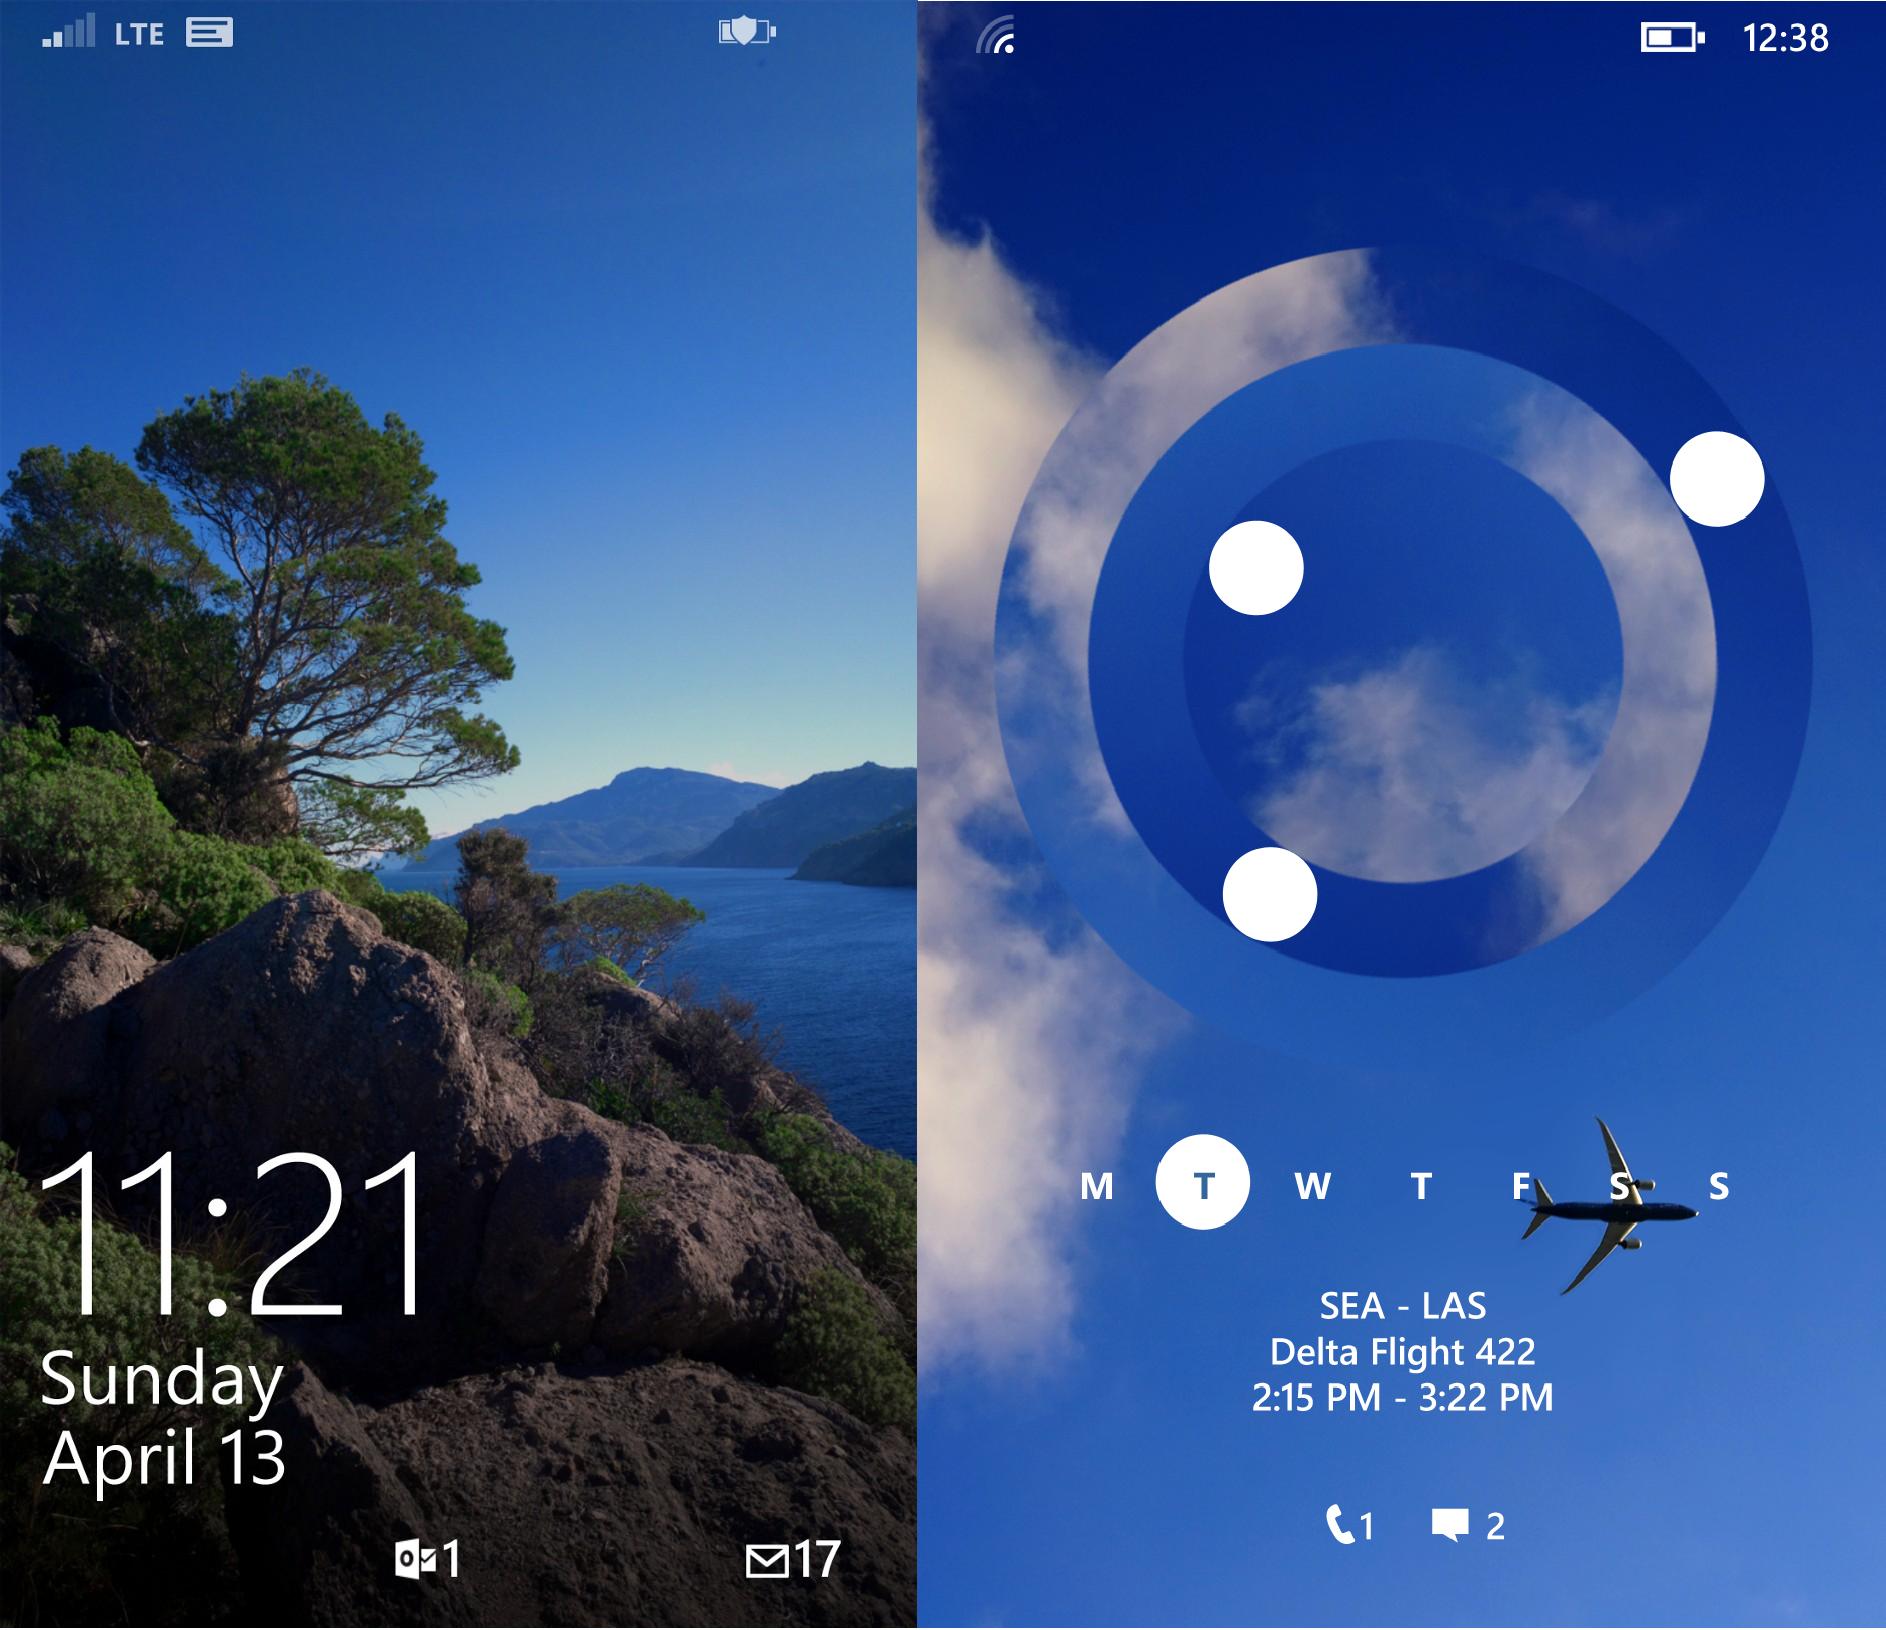 Lock Wallpaper Windows 8 Windows Phone 81 Lock 1886x1630